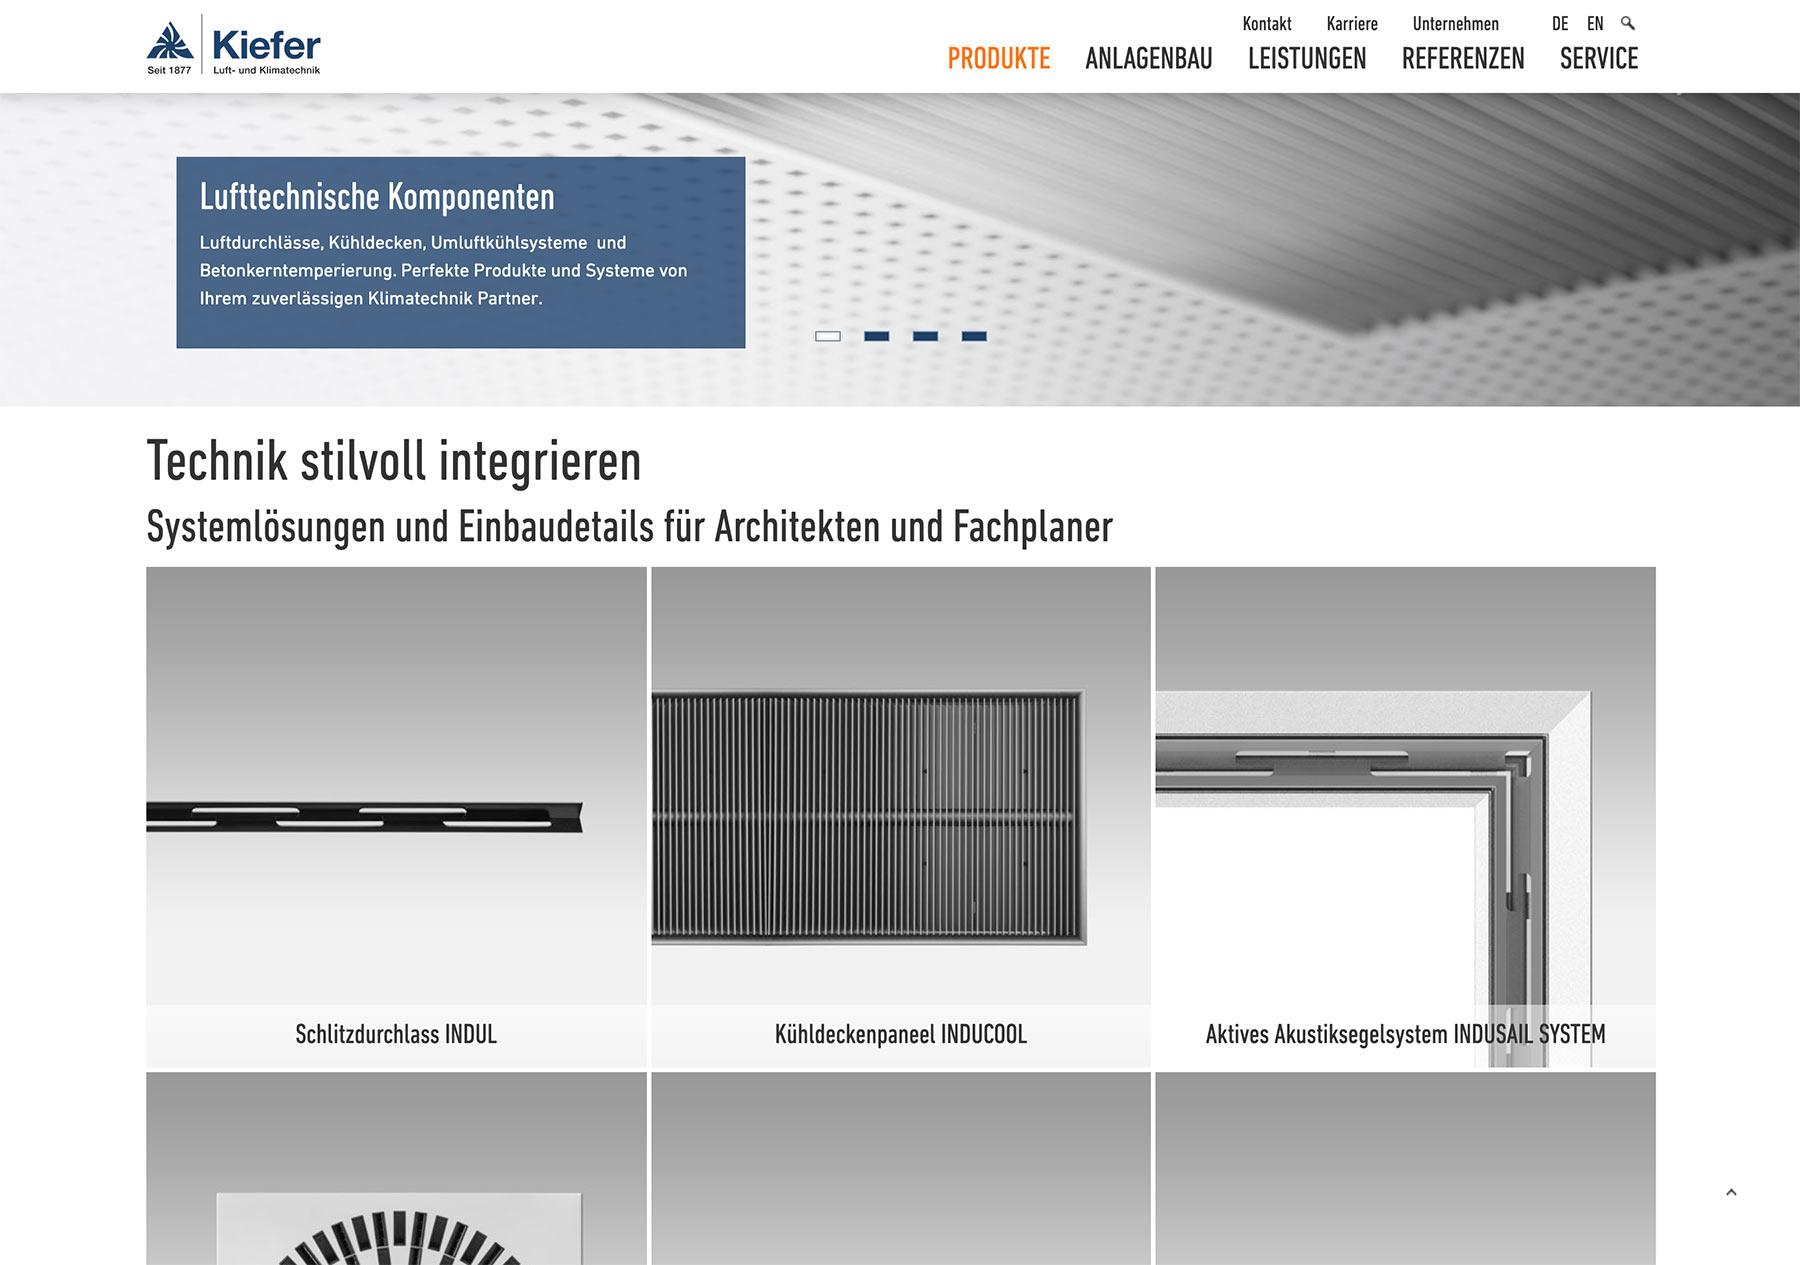 Kieferklima Typo3 Webdesign Screendesign Detail